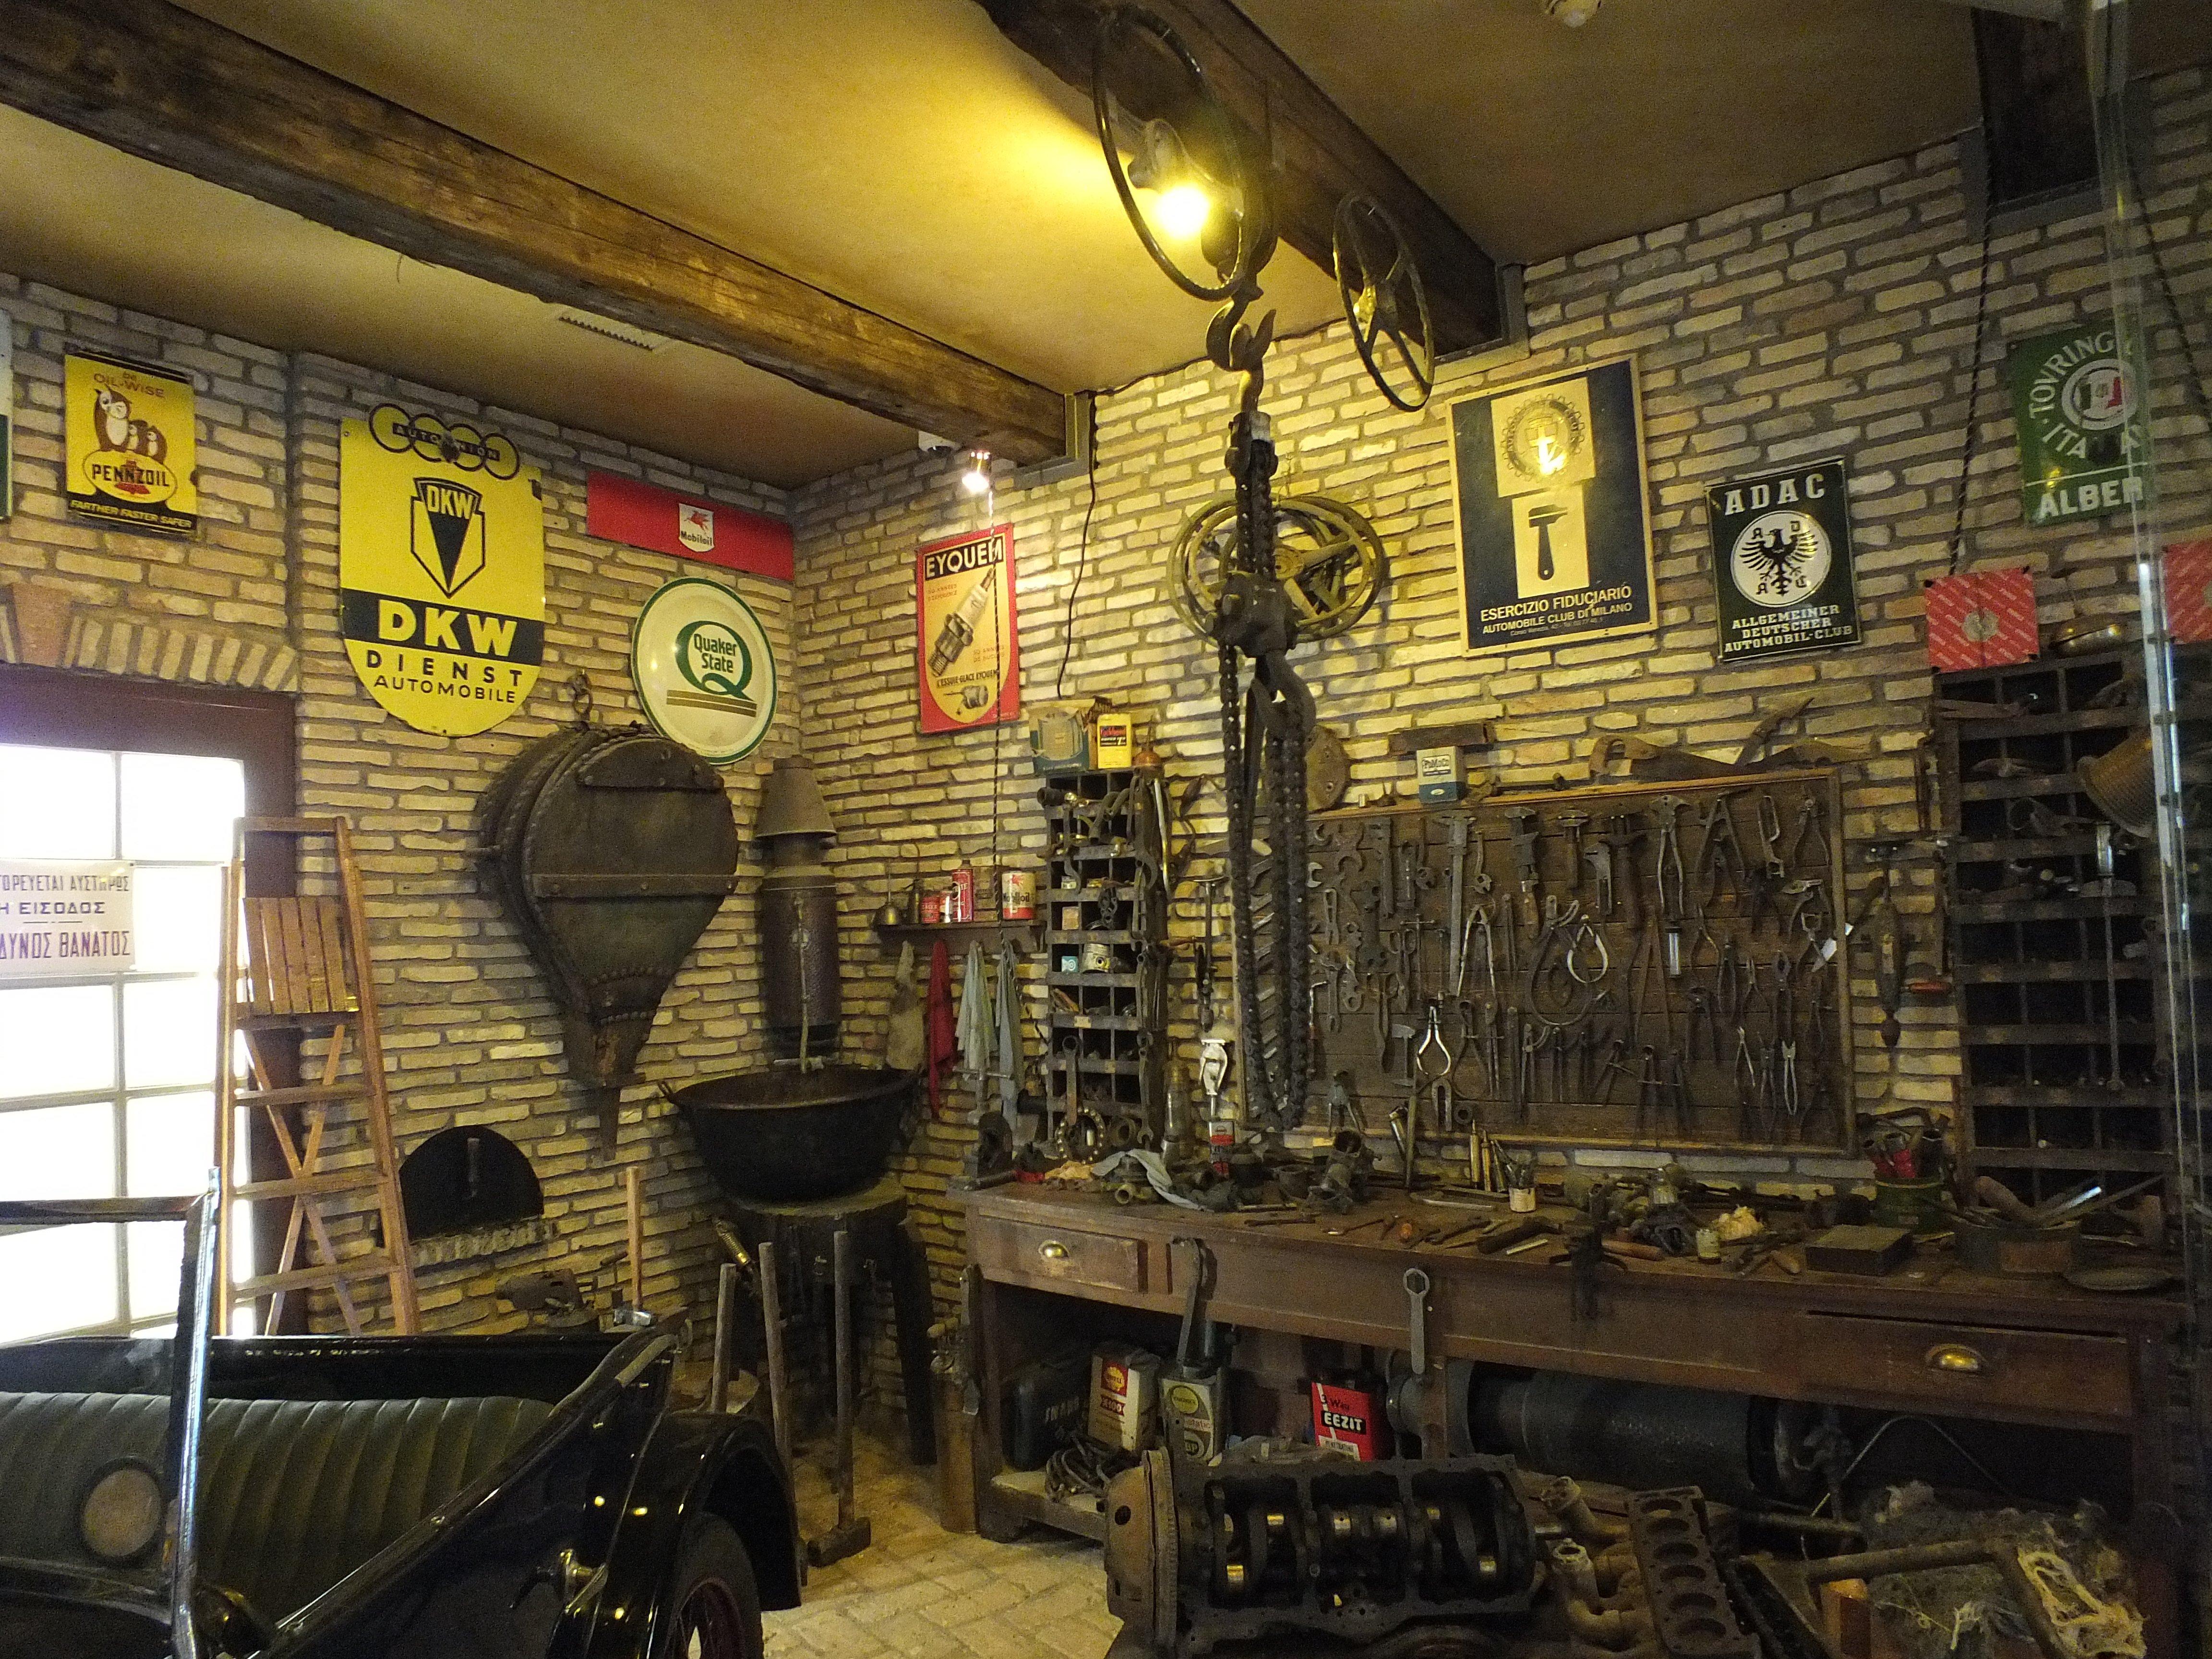 home auto garage ideas - Oldtimer car workshop retro wallpaper 4608x3456